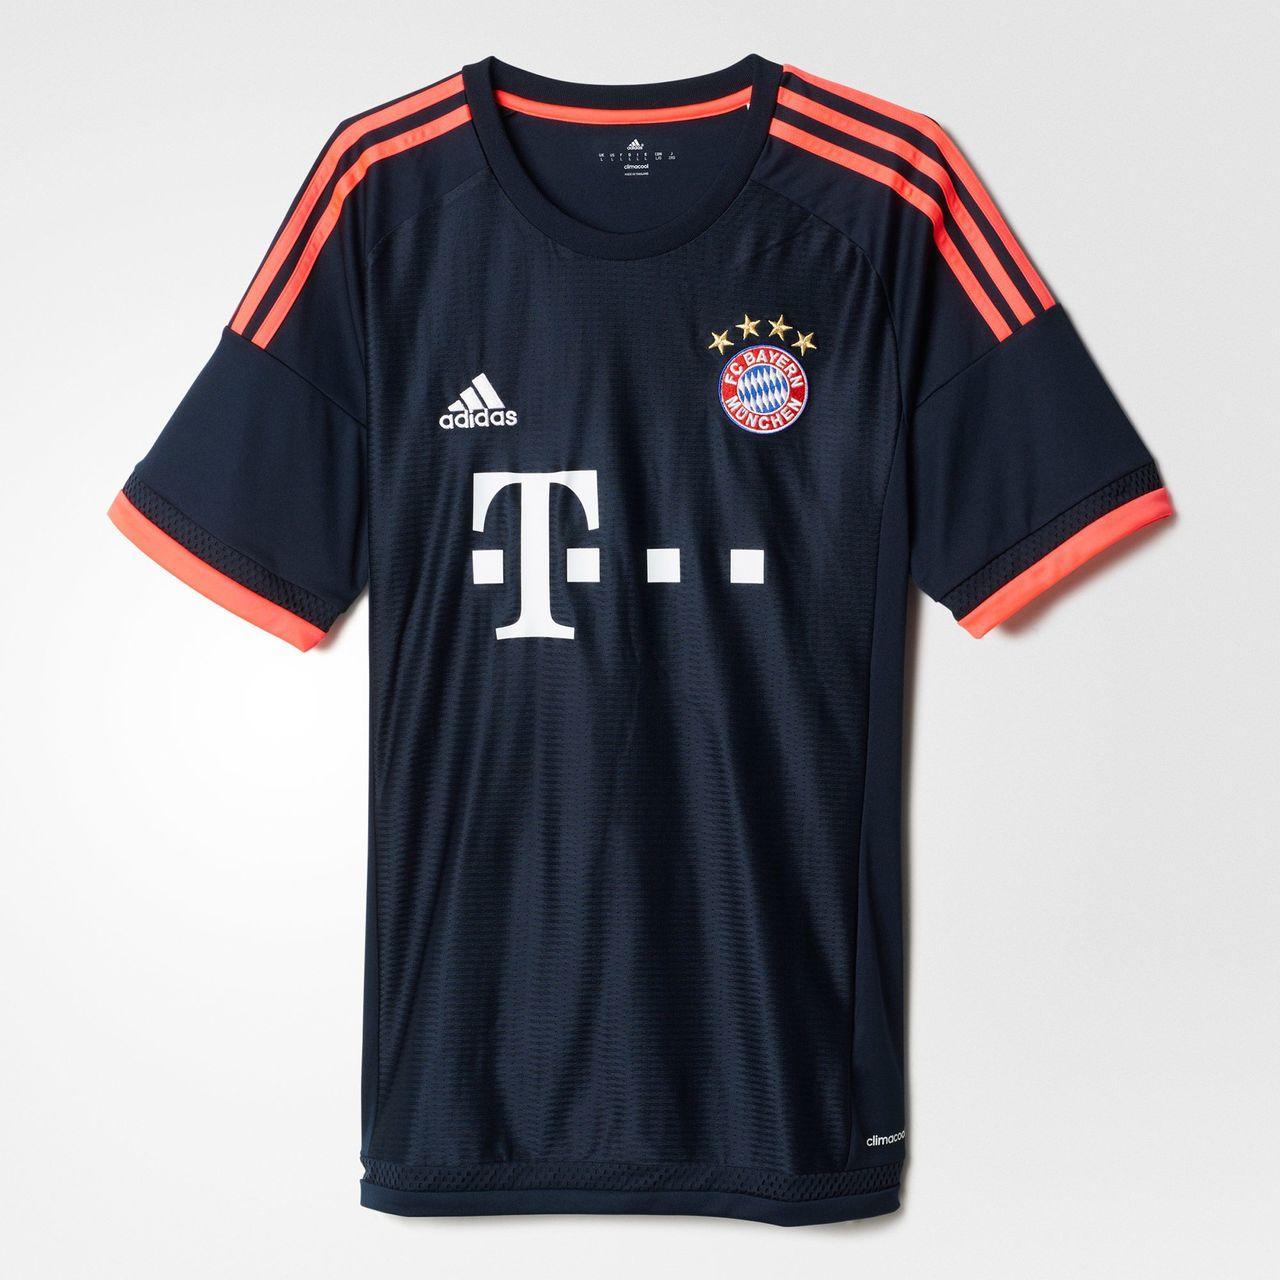 pretty nice 076e3 d94b3 Bayern Munich 15/16 Adidas Third Kit | 15/16 Kits | Football ...